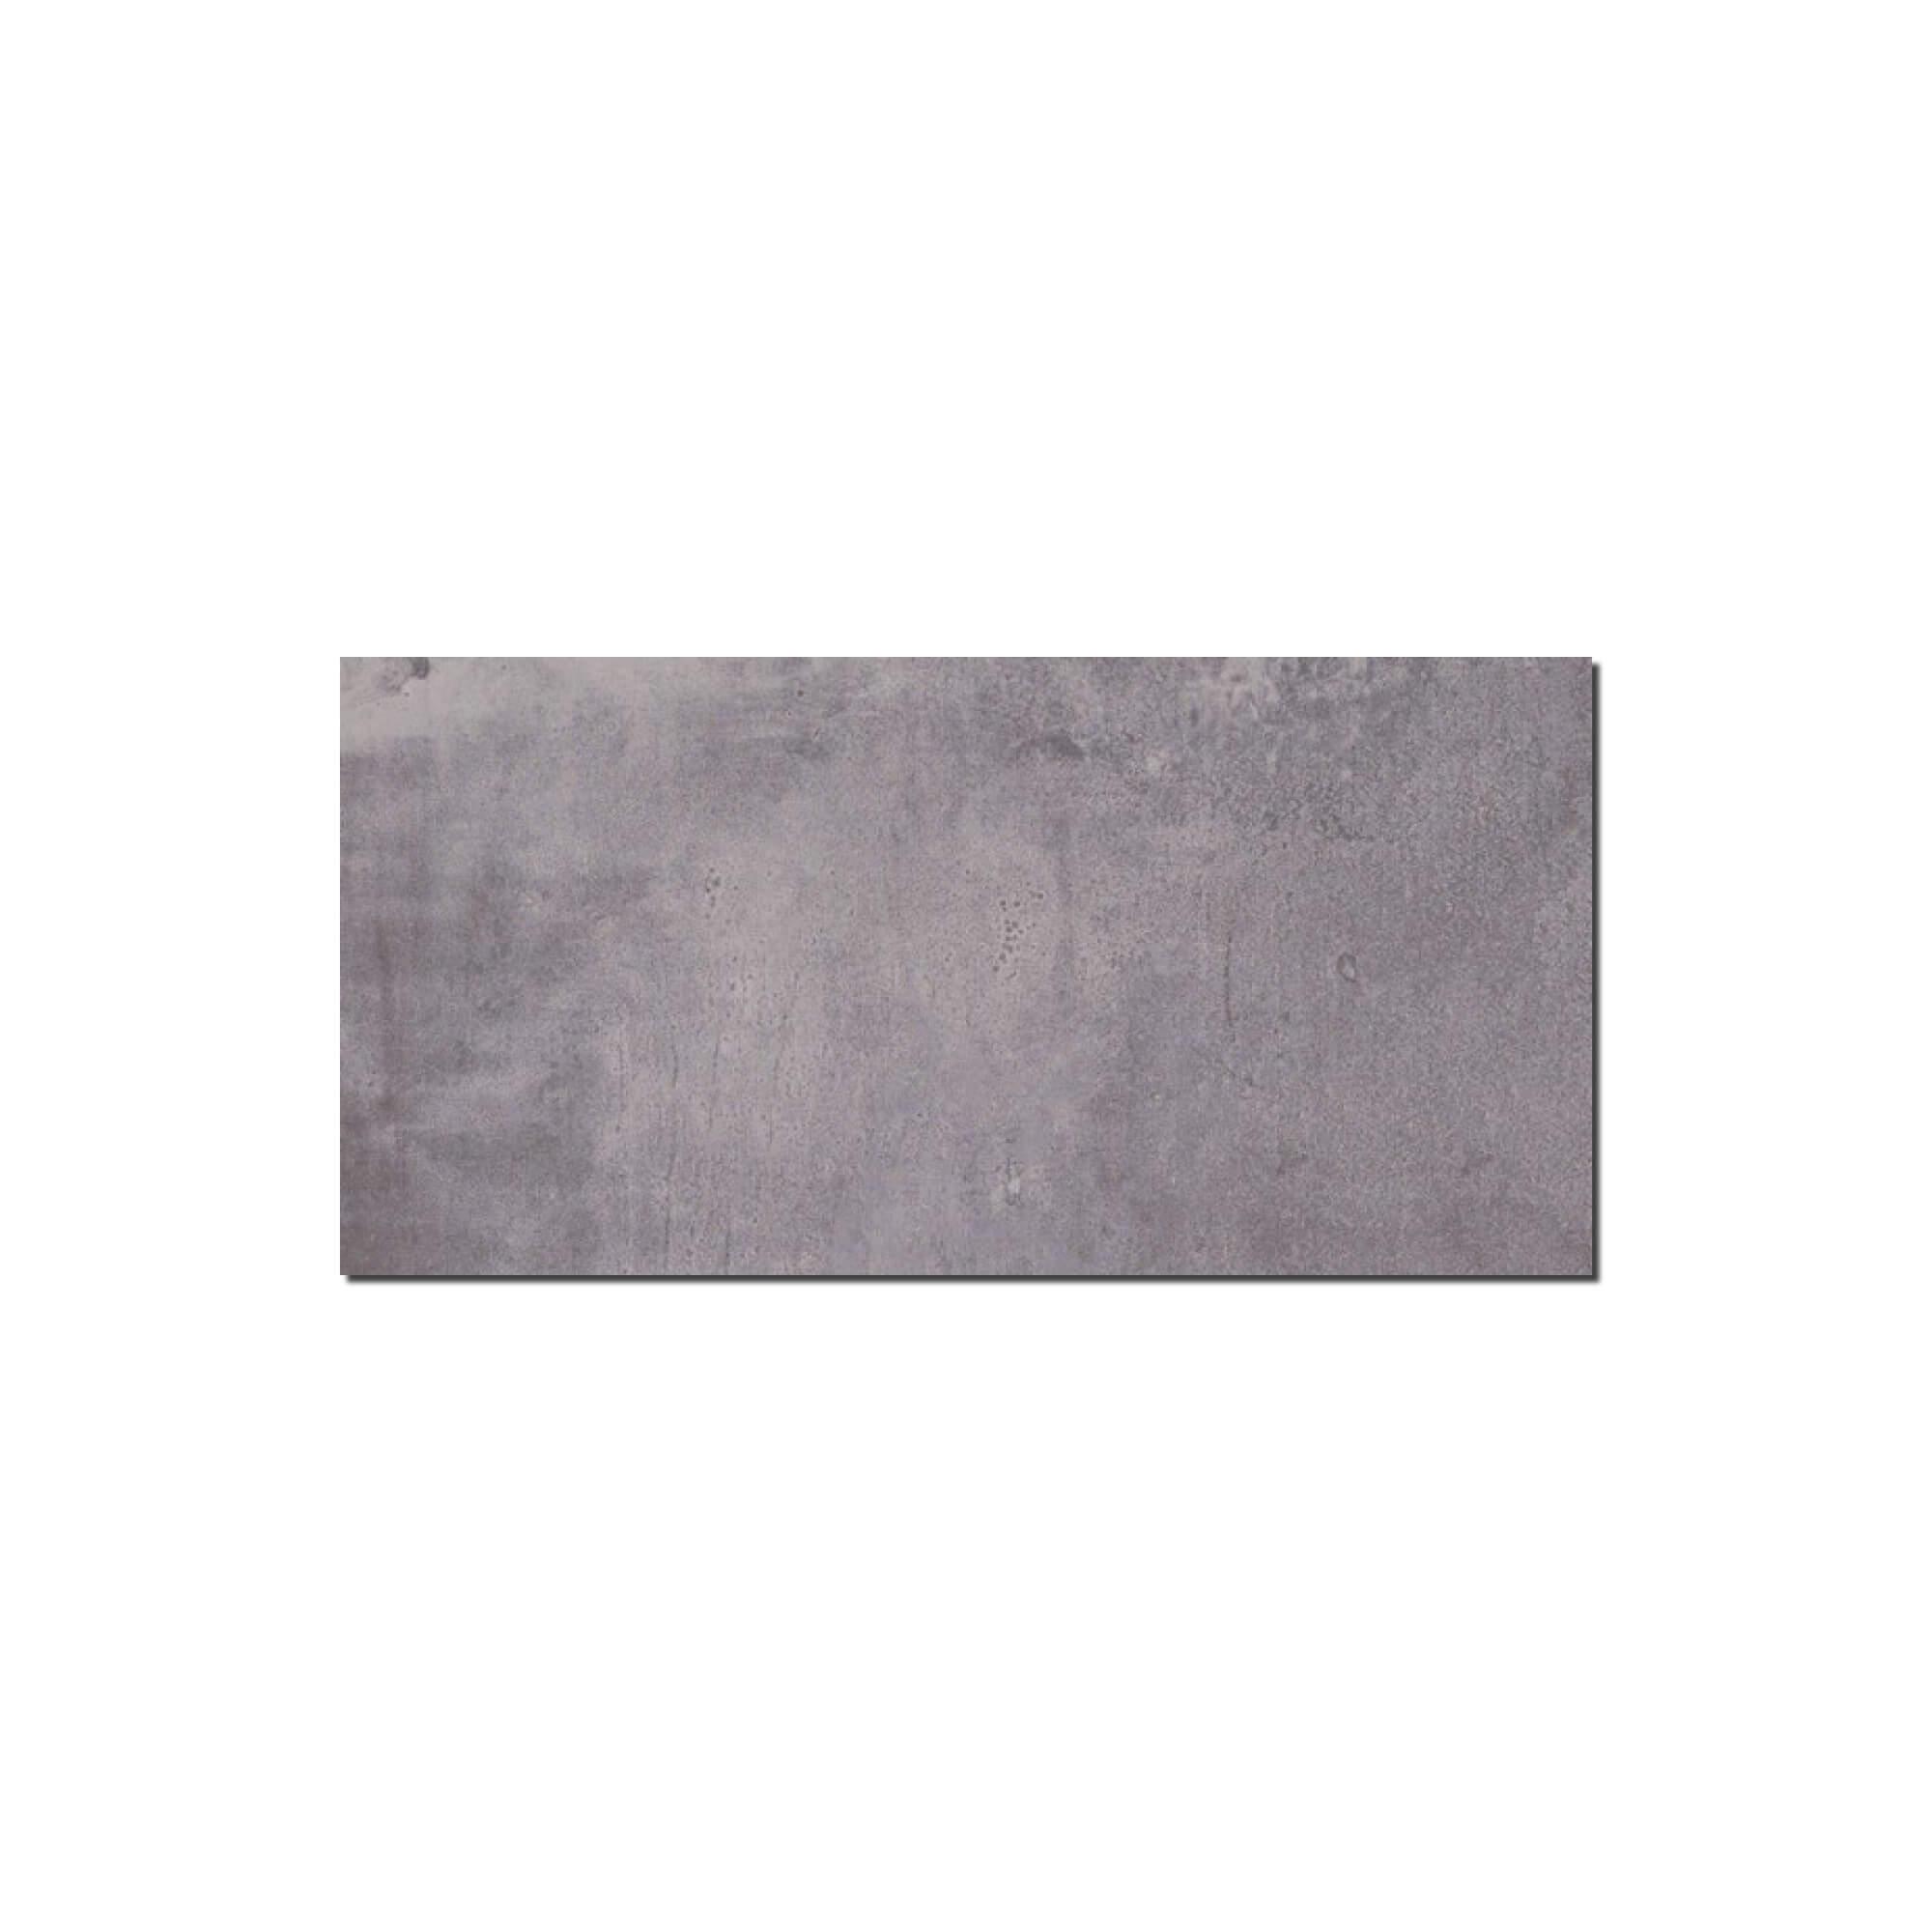 Carrelage sol et mur aspect béton Nice Cenere 30x60 cm